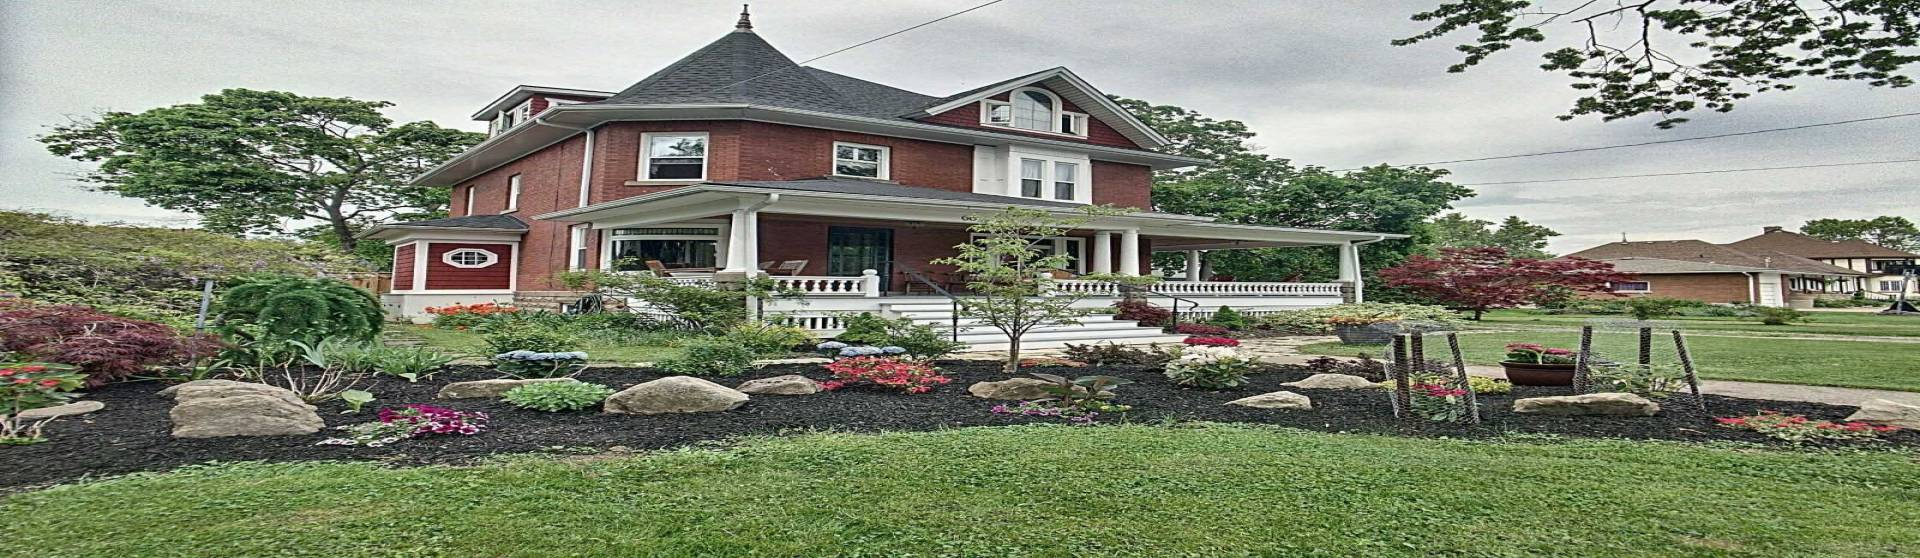 60 Maple Ave, Welland, Ontario L3C5G1, 5 Bedrooms Bedrooms, 8 Rooms Rooms,3 BathroomsBathrooms,Detached,Sale,Maple,X4726842